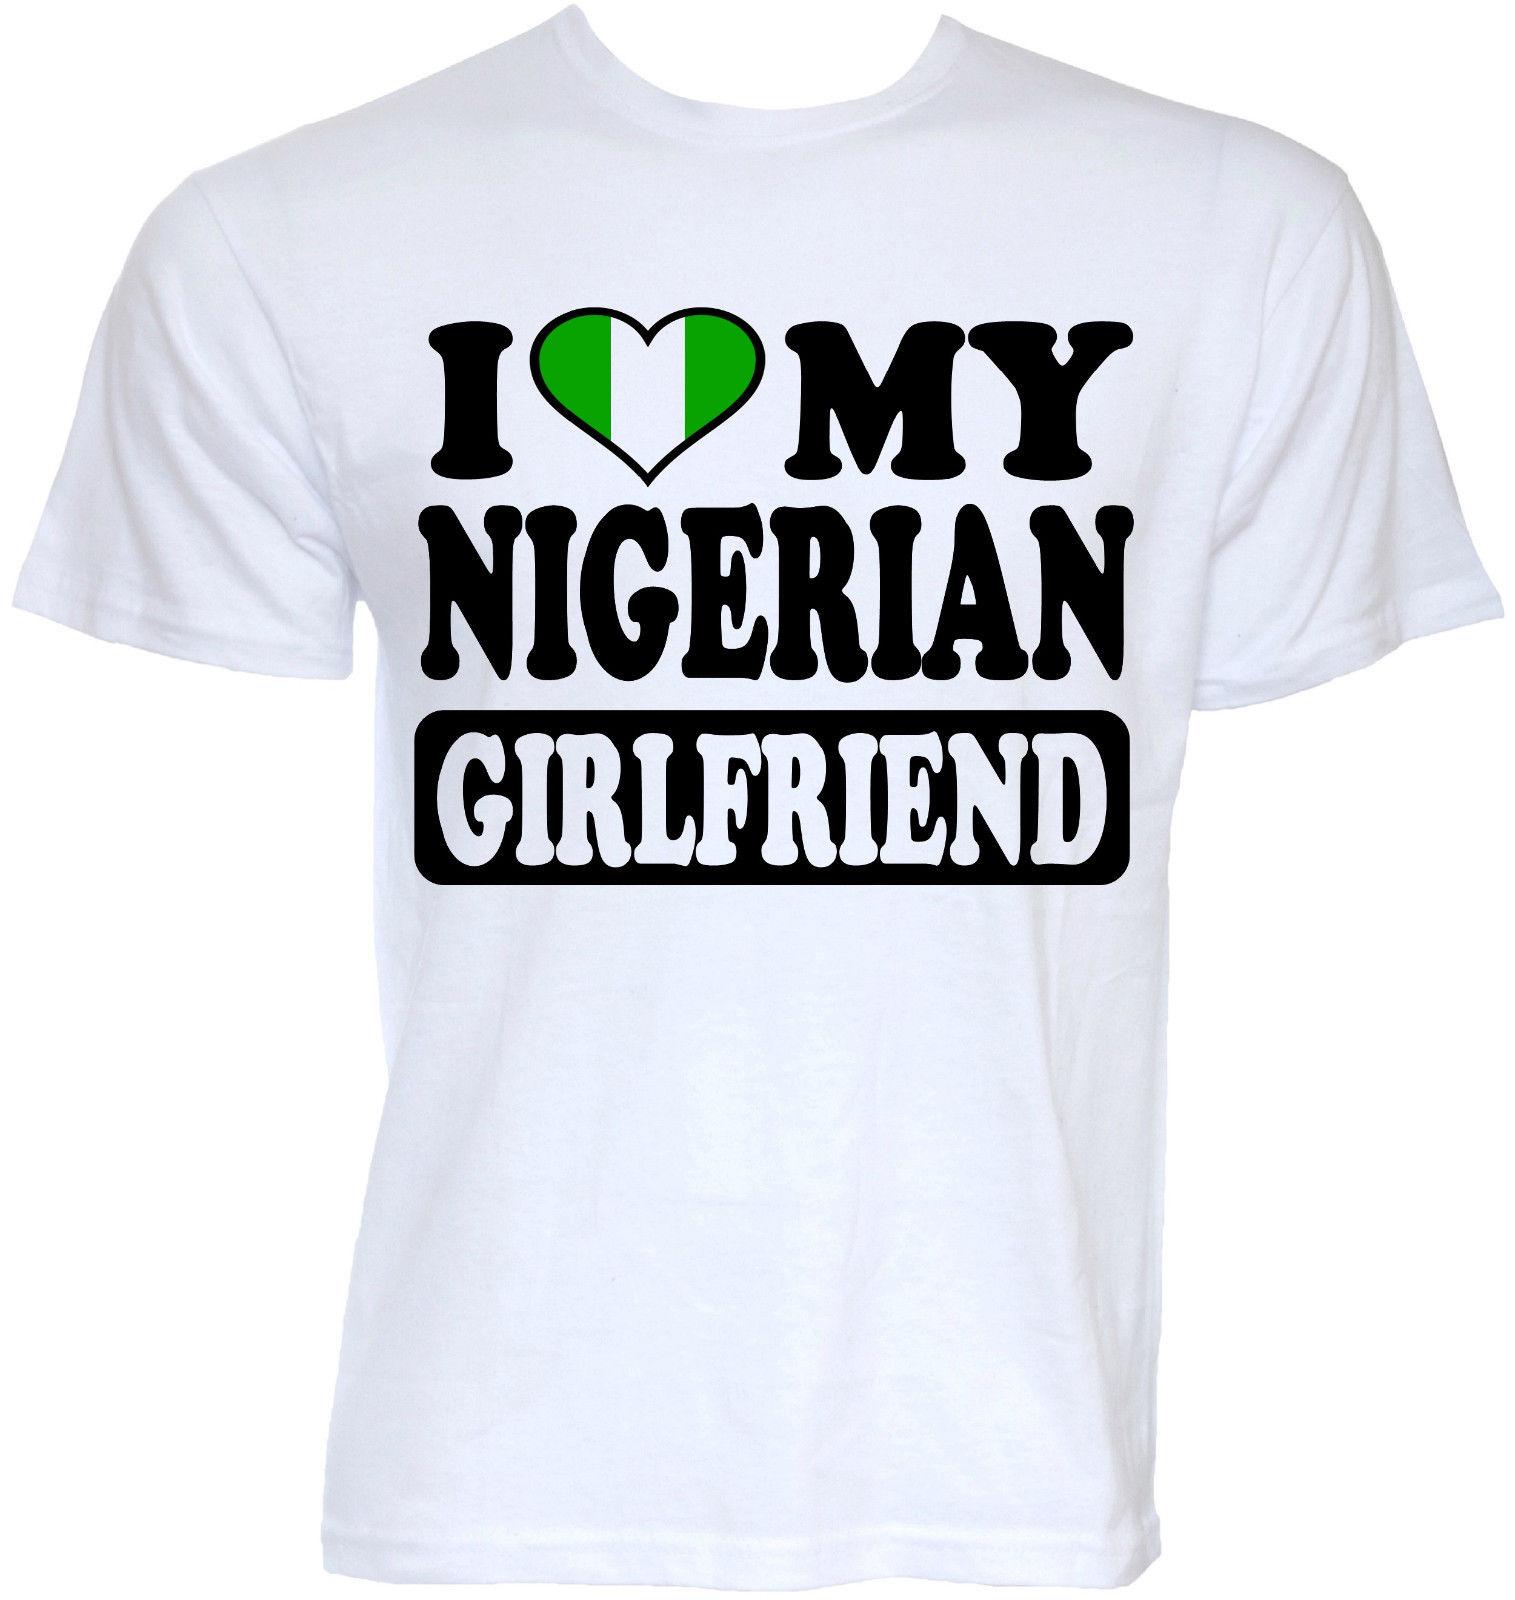 Shirt design in nigeria - Mens Funny Cool Novelty Nigerian Girlfriend Nigeria Flag T Shirts Joke Fun Gifts Summer New